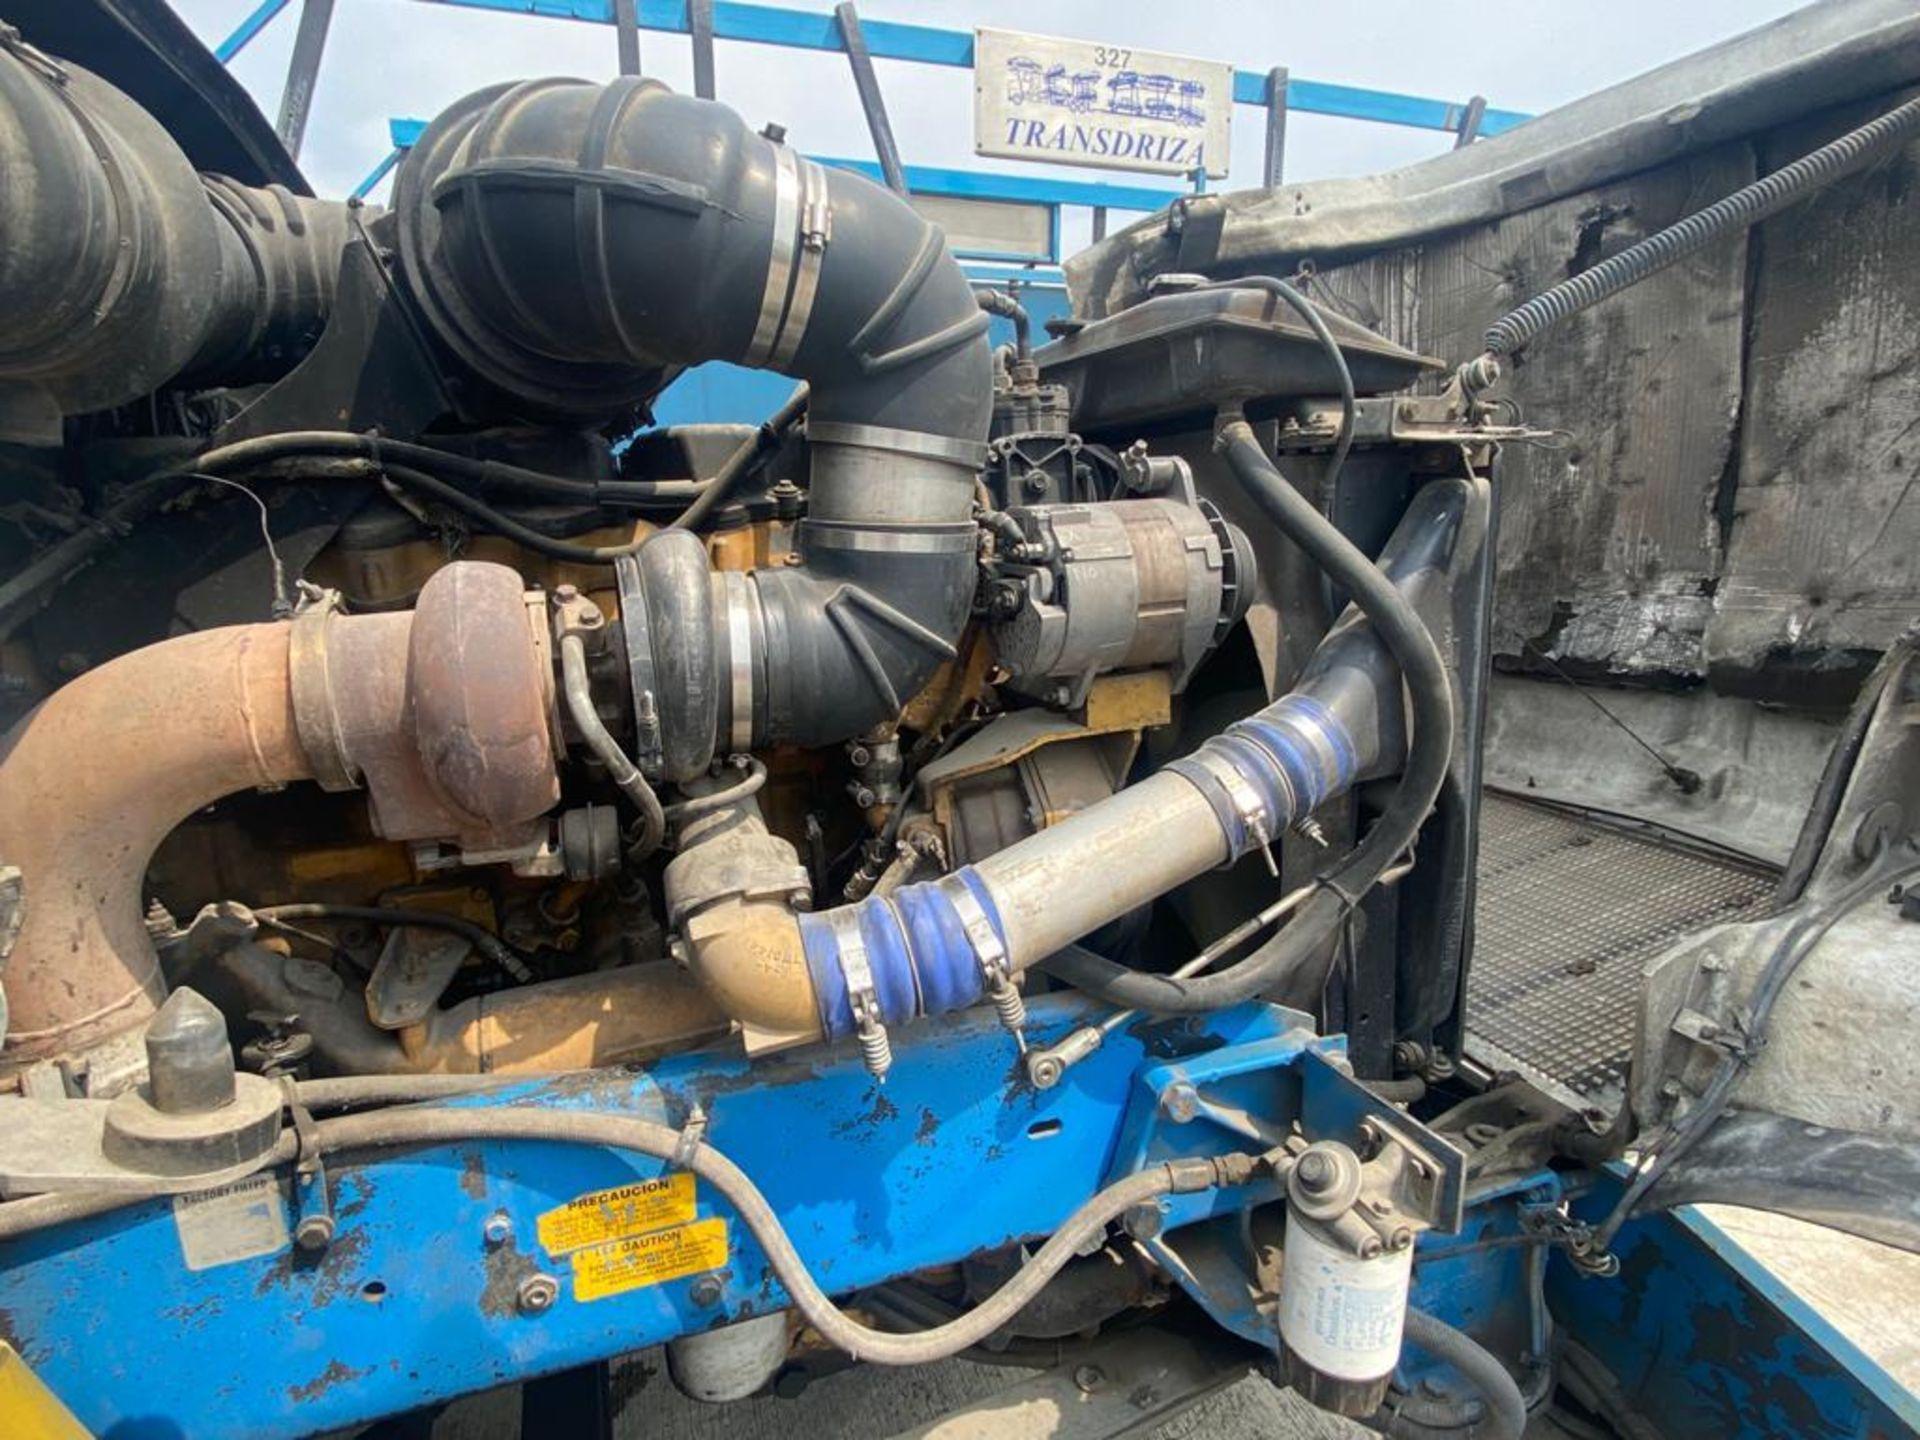 1999 Kenworth Sleeper truck tractor, standard transmission of 18 speeds - Image 47 of 62